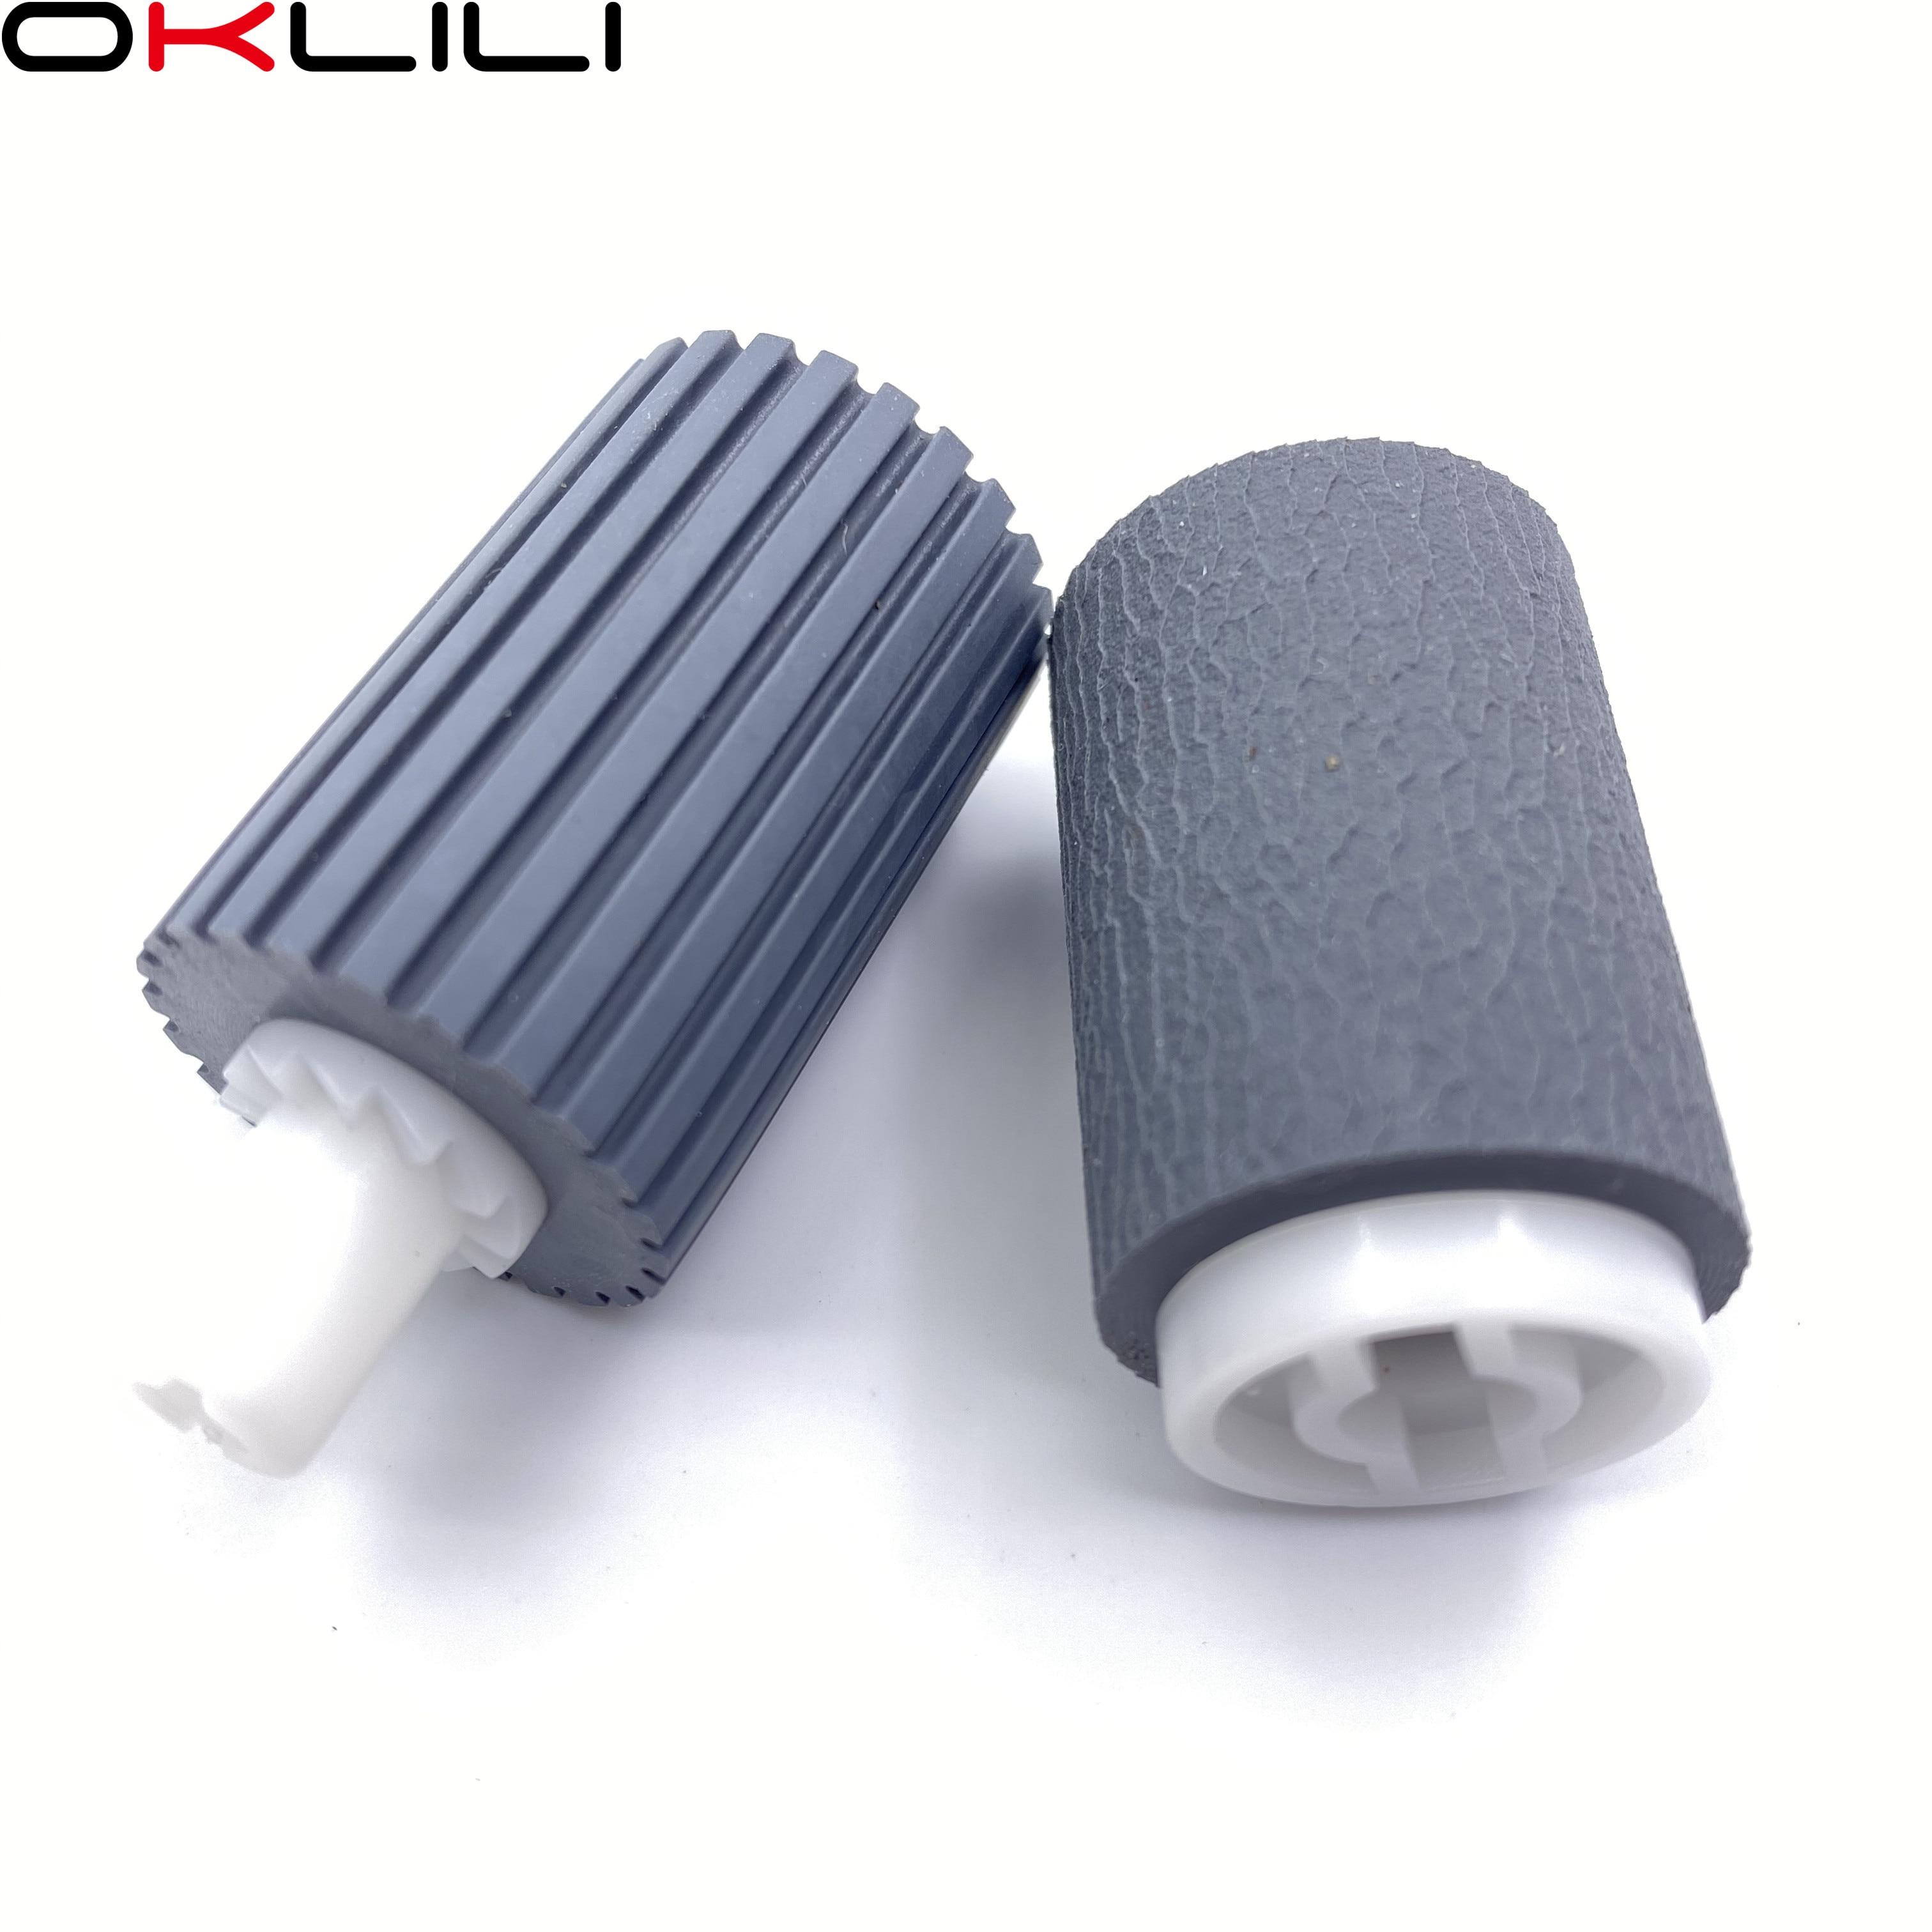 20X 3BR07040 36211110 ADF Feed Pickup Roller for Kyocera M2030 M2035 M2040 M2135 M2235 M2530 M2535 M2540 M2635 M2640 M2735 M2835